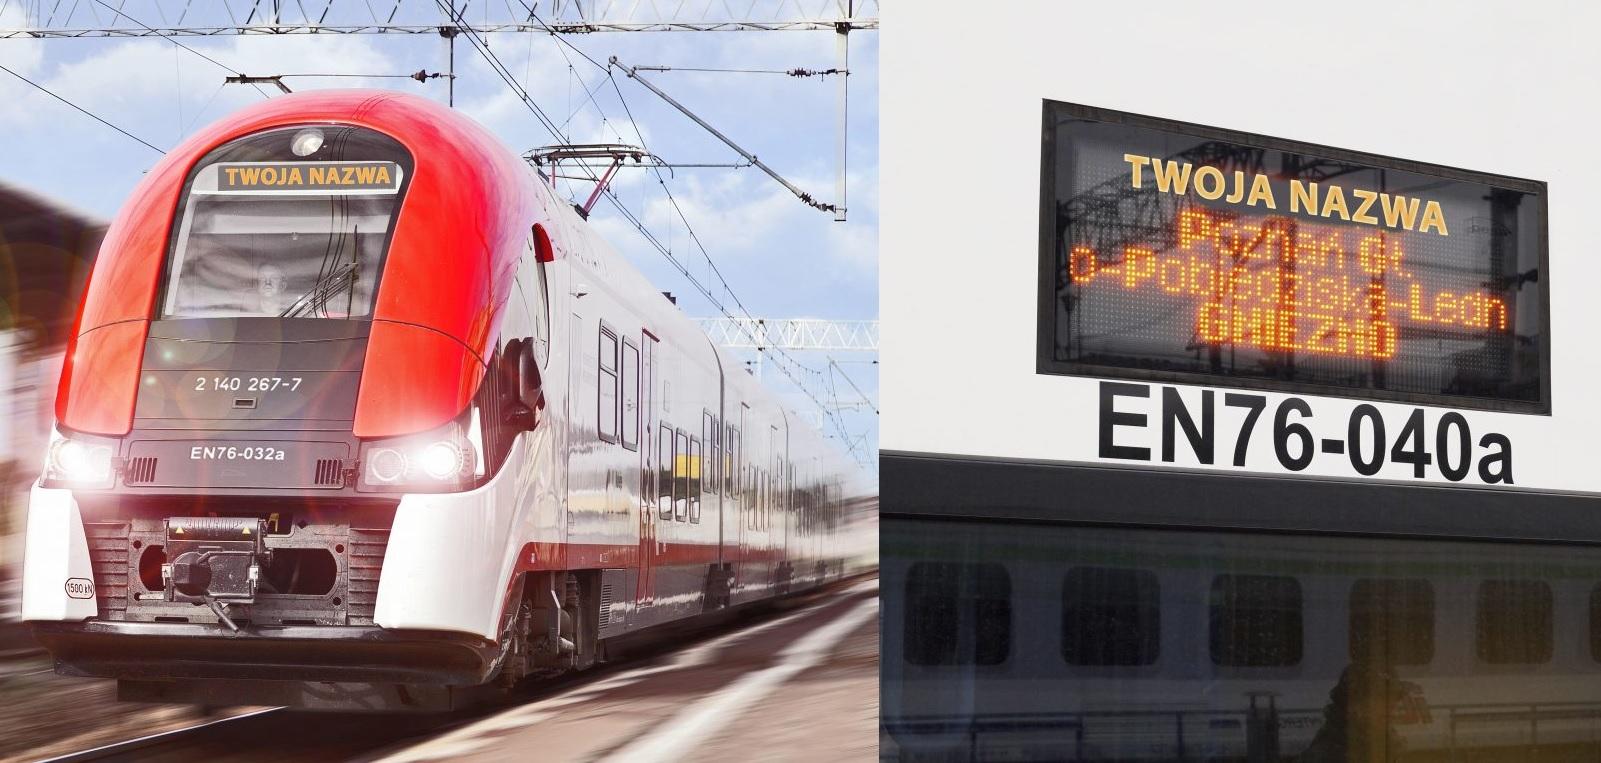 koleje wielkopolskie wośp - Koleje Wielkopolskie